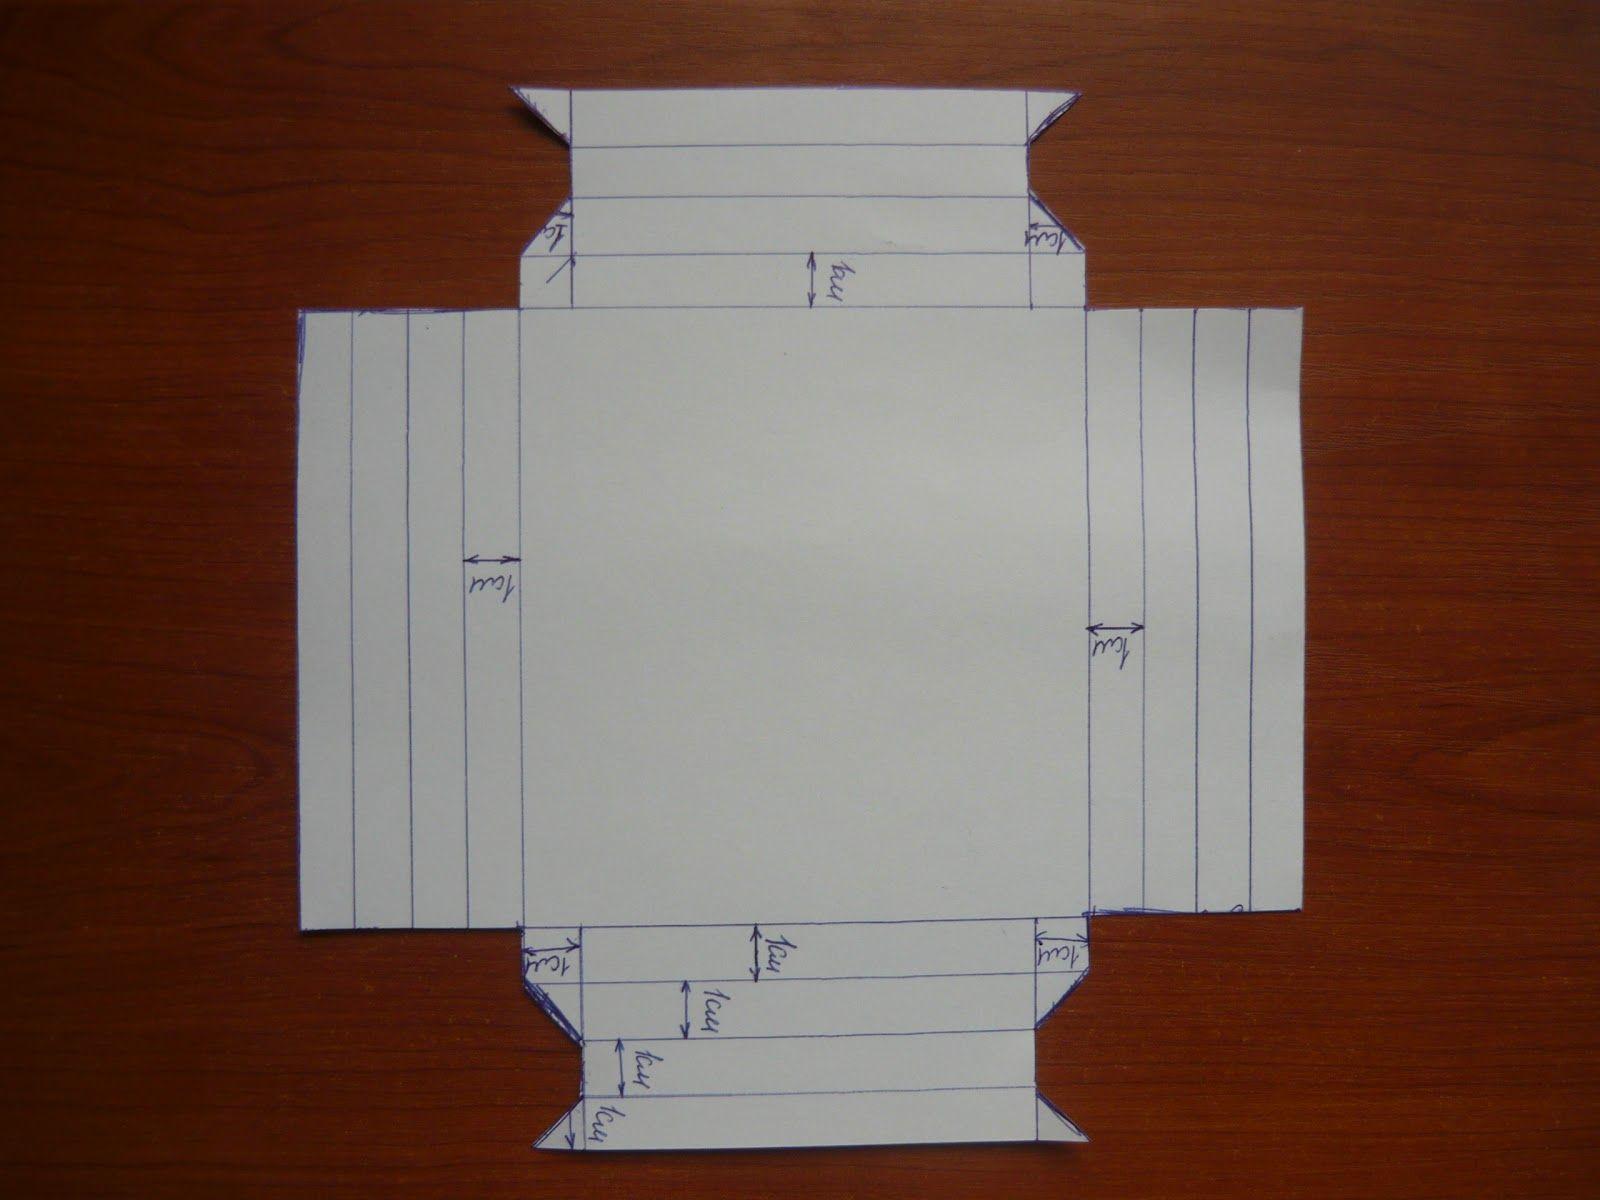 Фоторамка из бумаги своими руками 4 класс